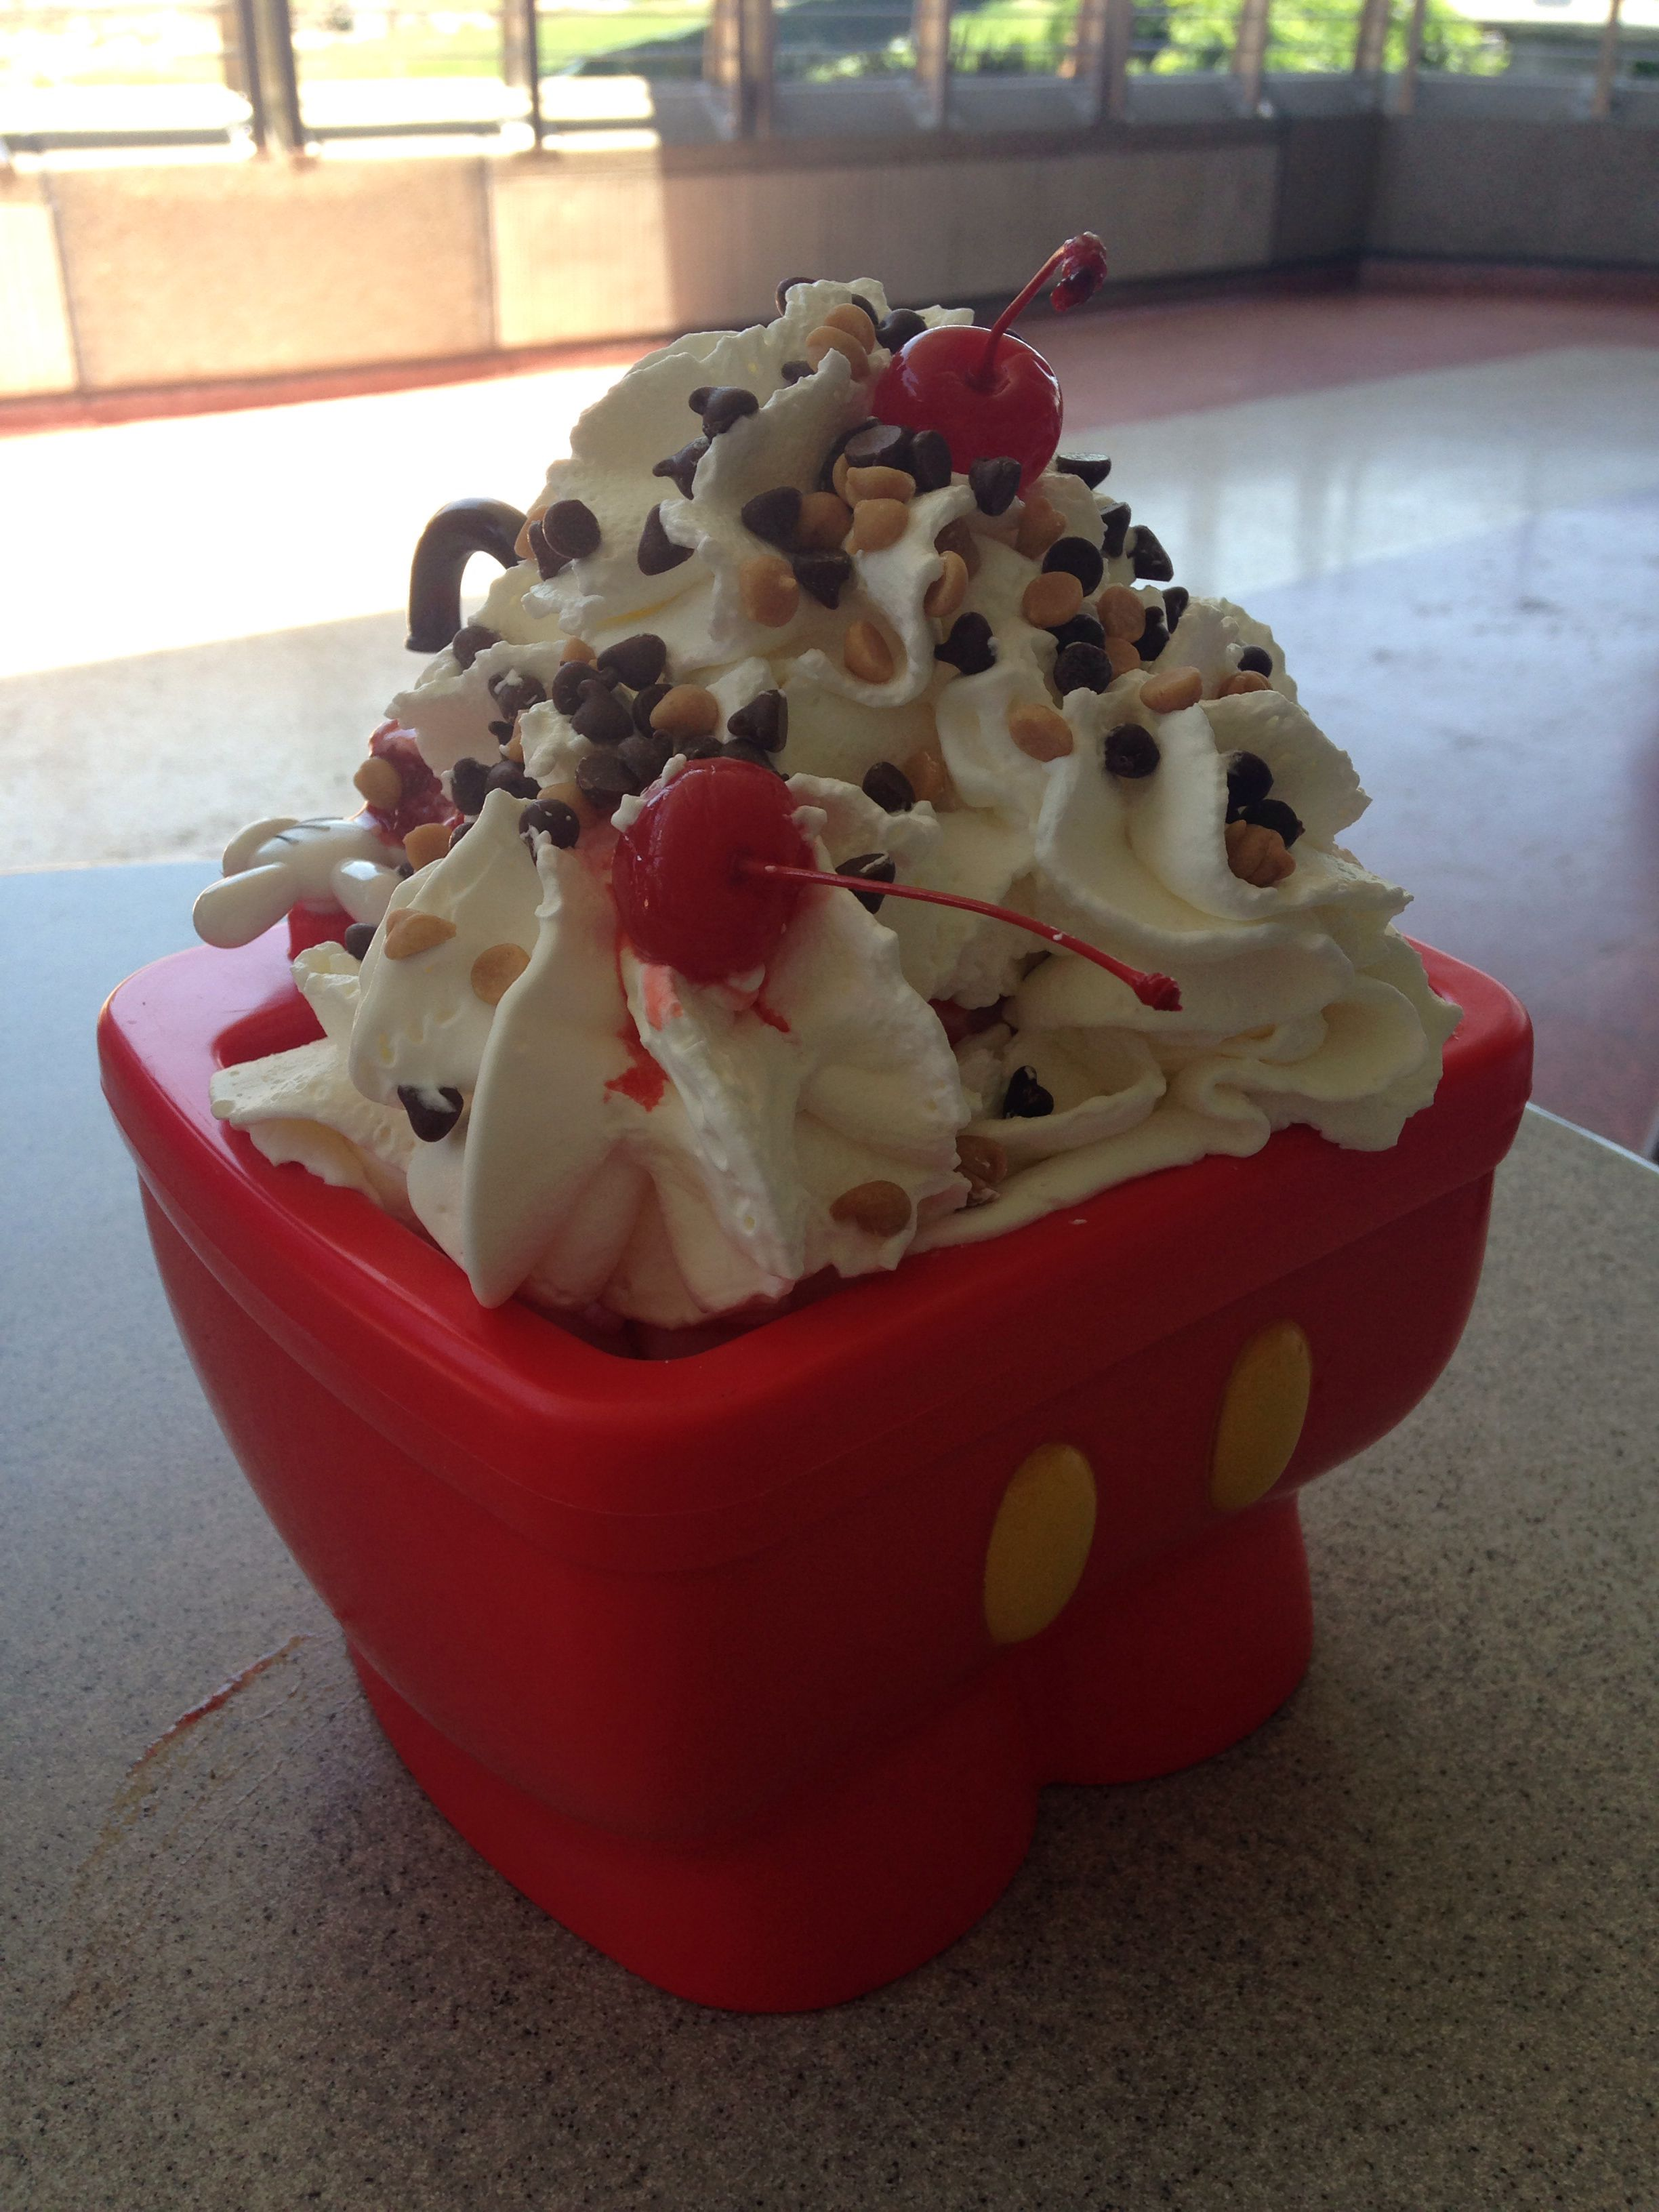 Mickey S Kitchen Sink Sundae At Magic Kingdom 2014 Disney World Mickey Kitchen Walt Disney